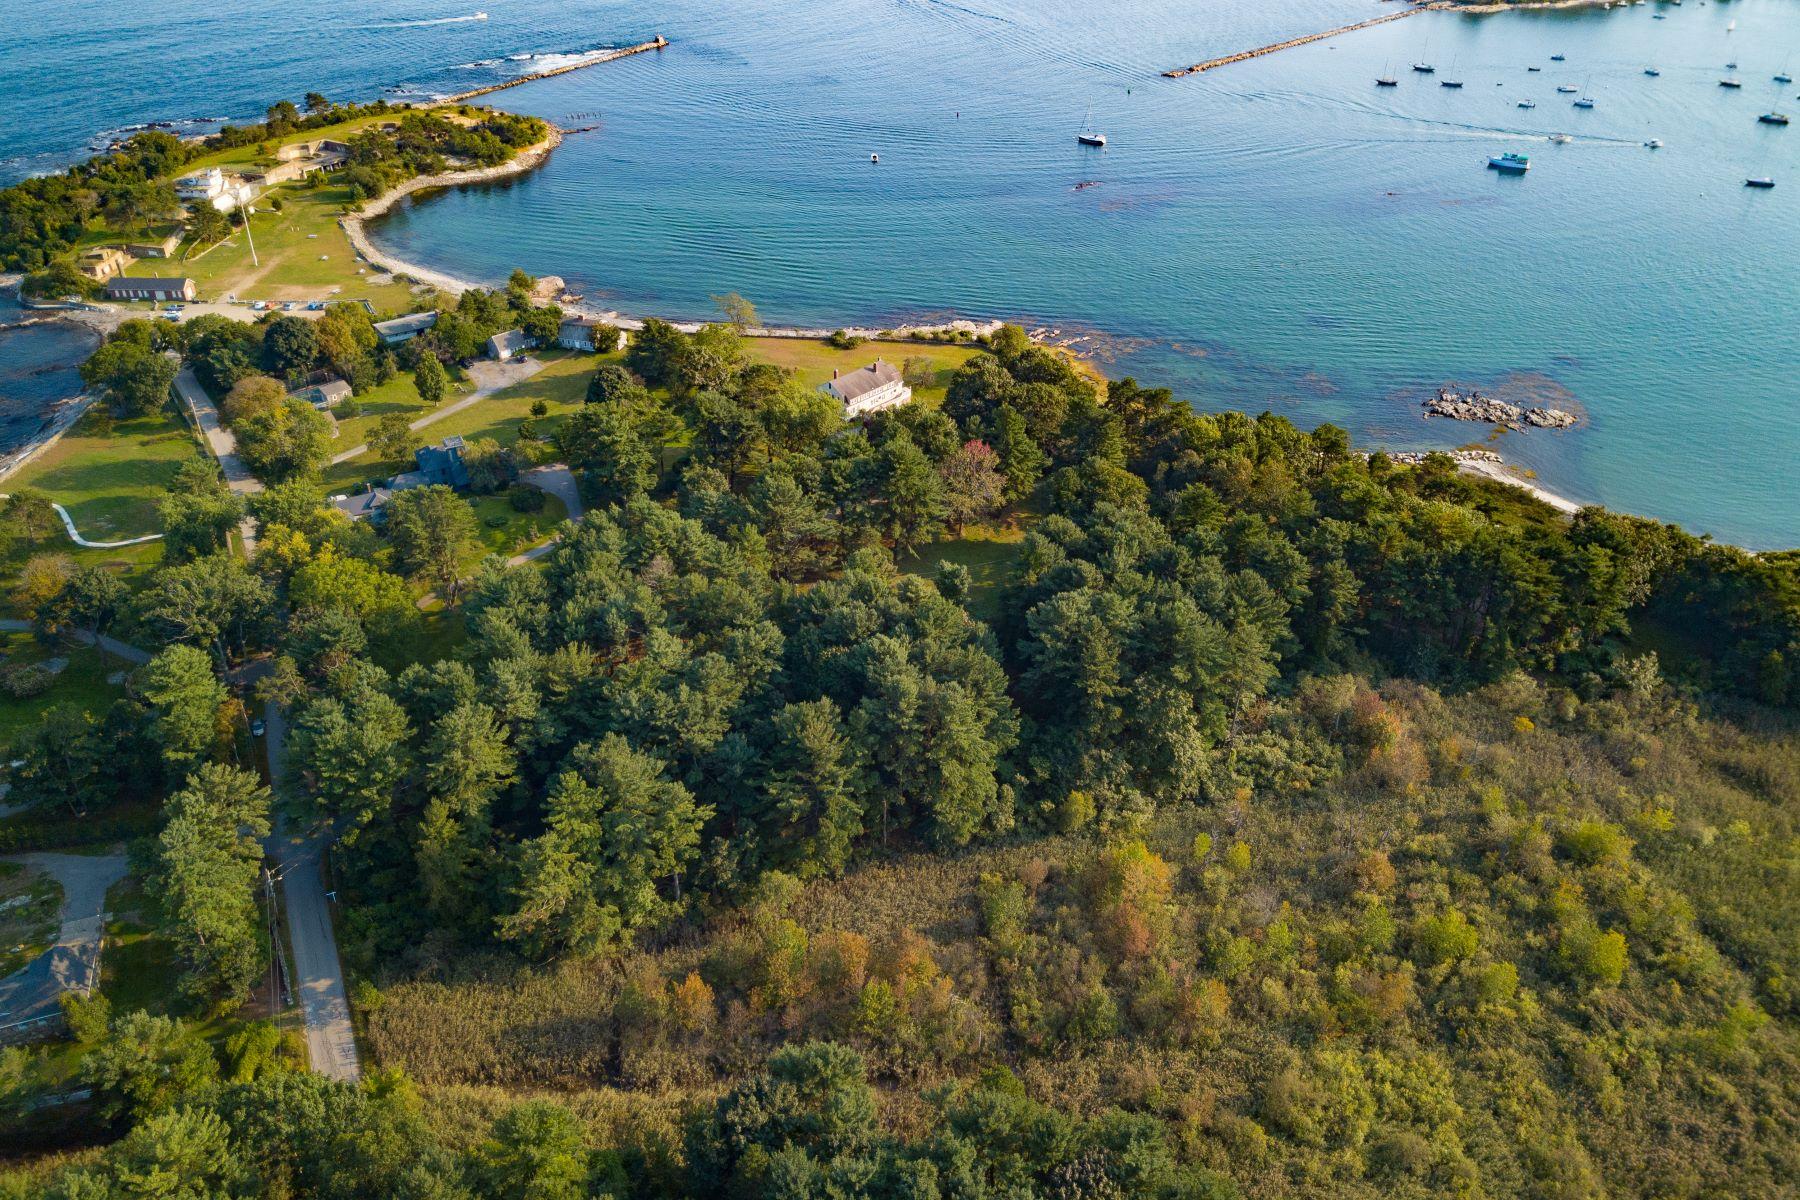 Land for Sale at Enjoy Life in Coastal New Castle 120-0 Wild Rose Lane New Castle, New Hampshire 03854 United States